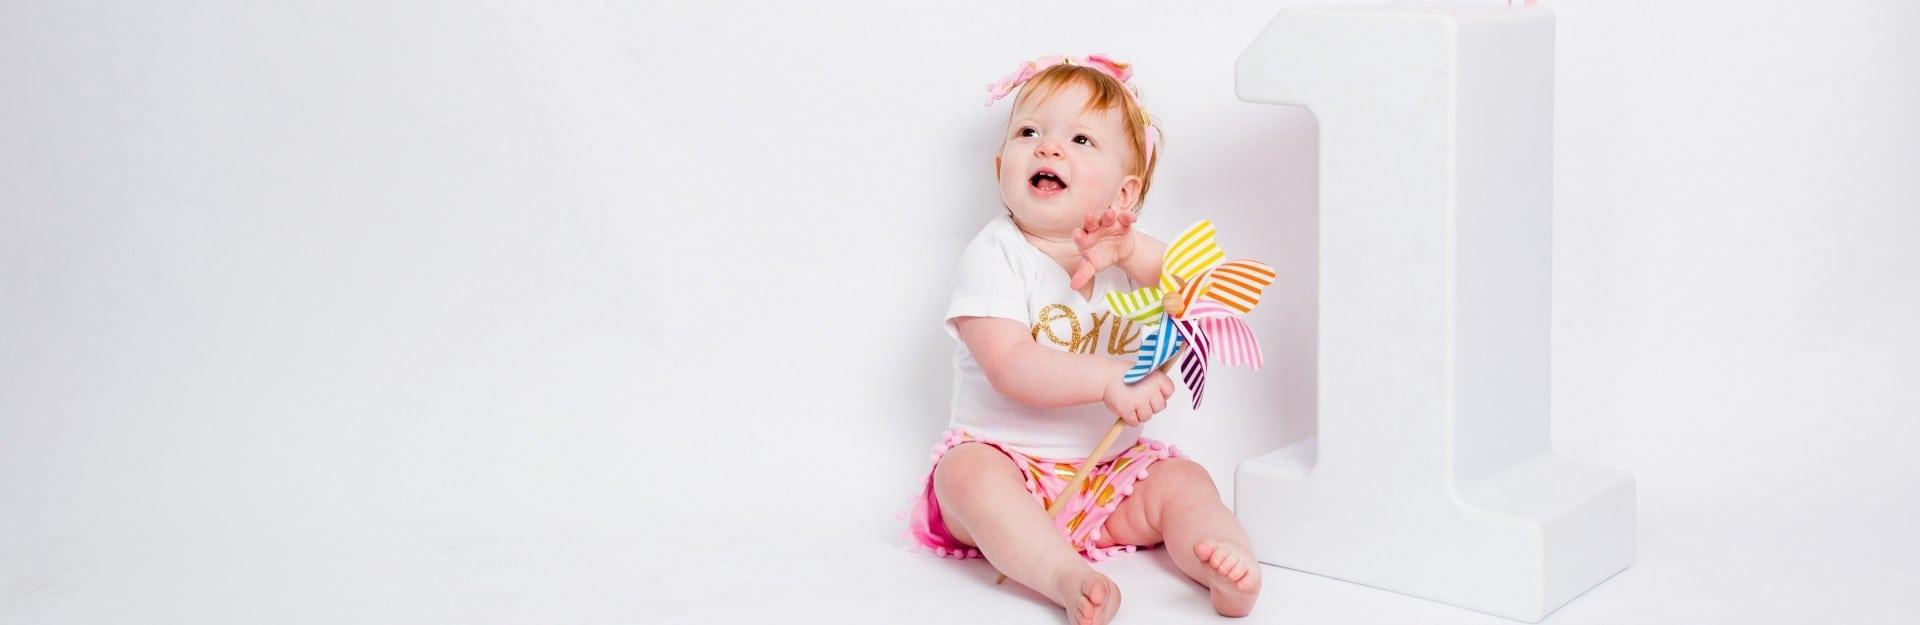 Child Photography, San Antonio Child Photography, Photography Studio, San Antonio Child Photographer, Child Photographer